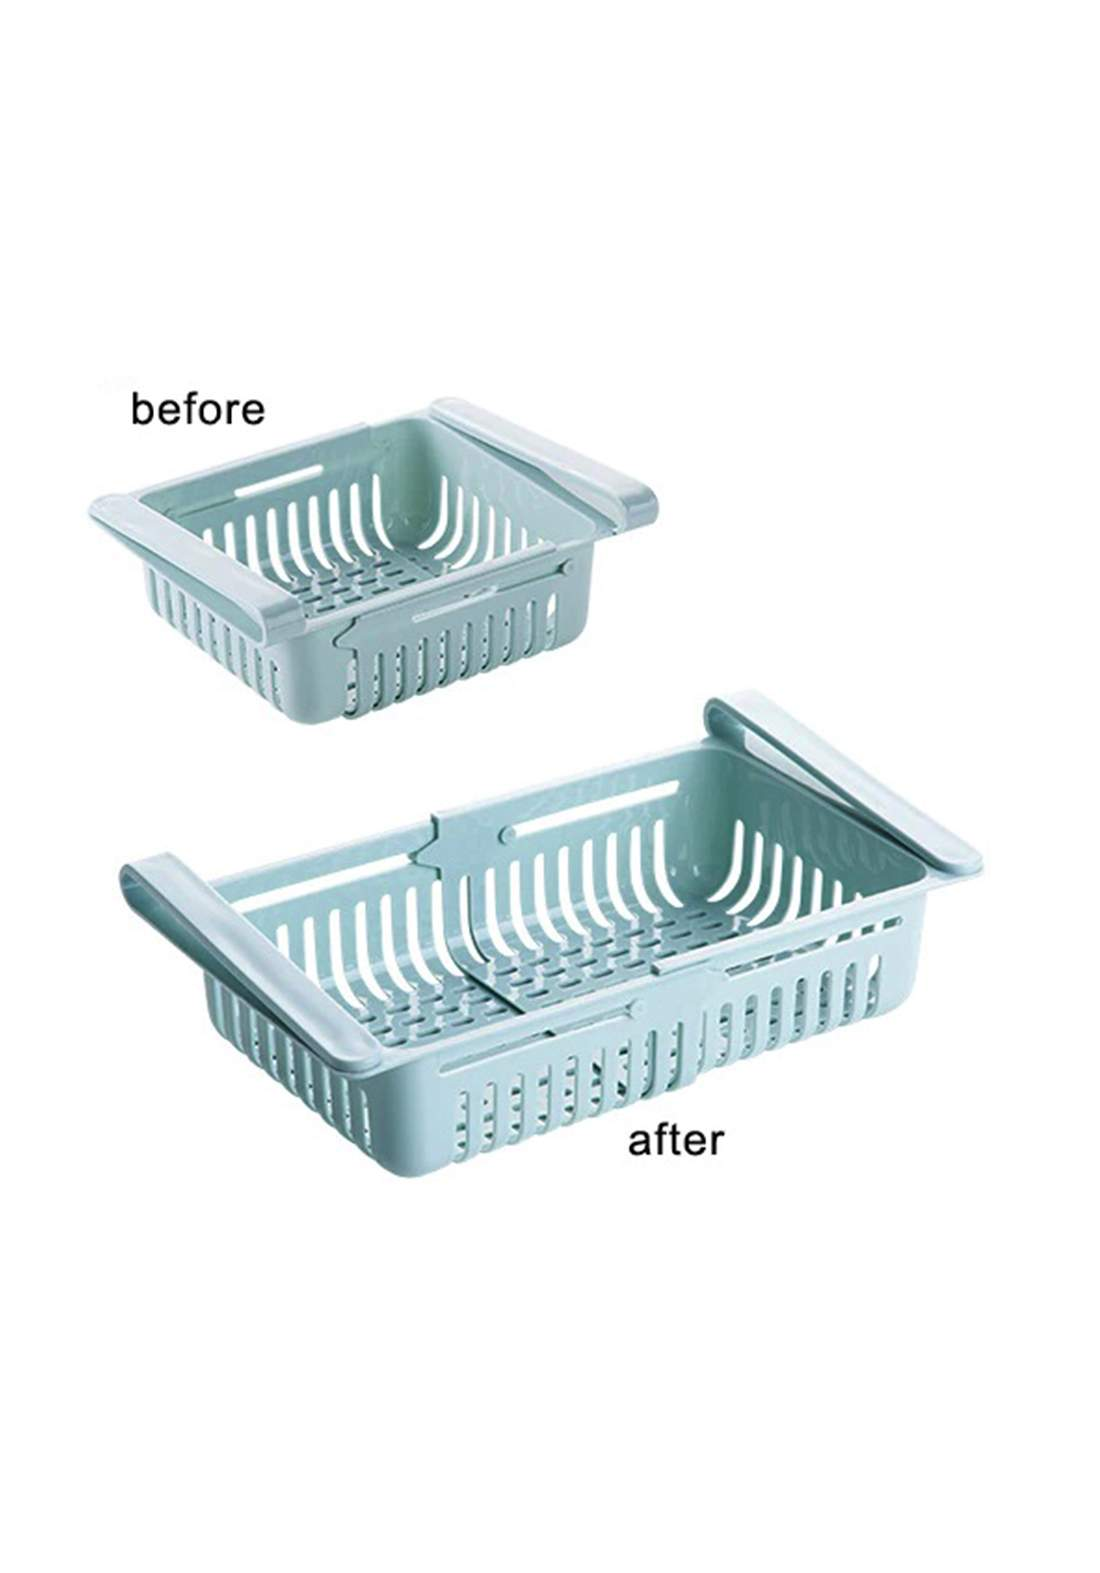 Adjustable Kitchen Organizer  مصفي ثالجة مجر سلايد 11-21